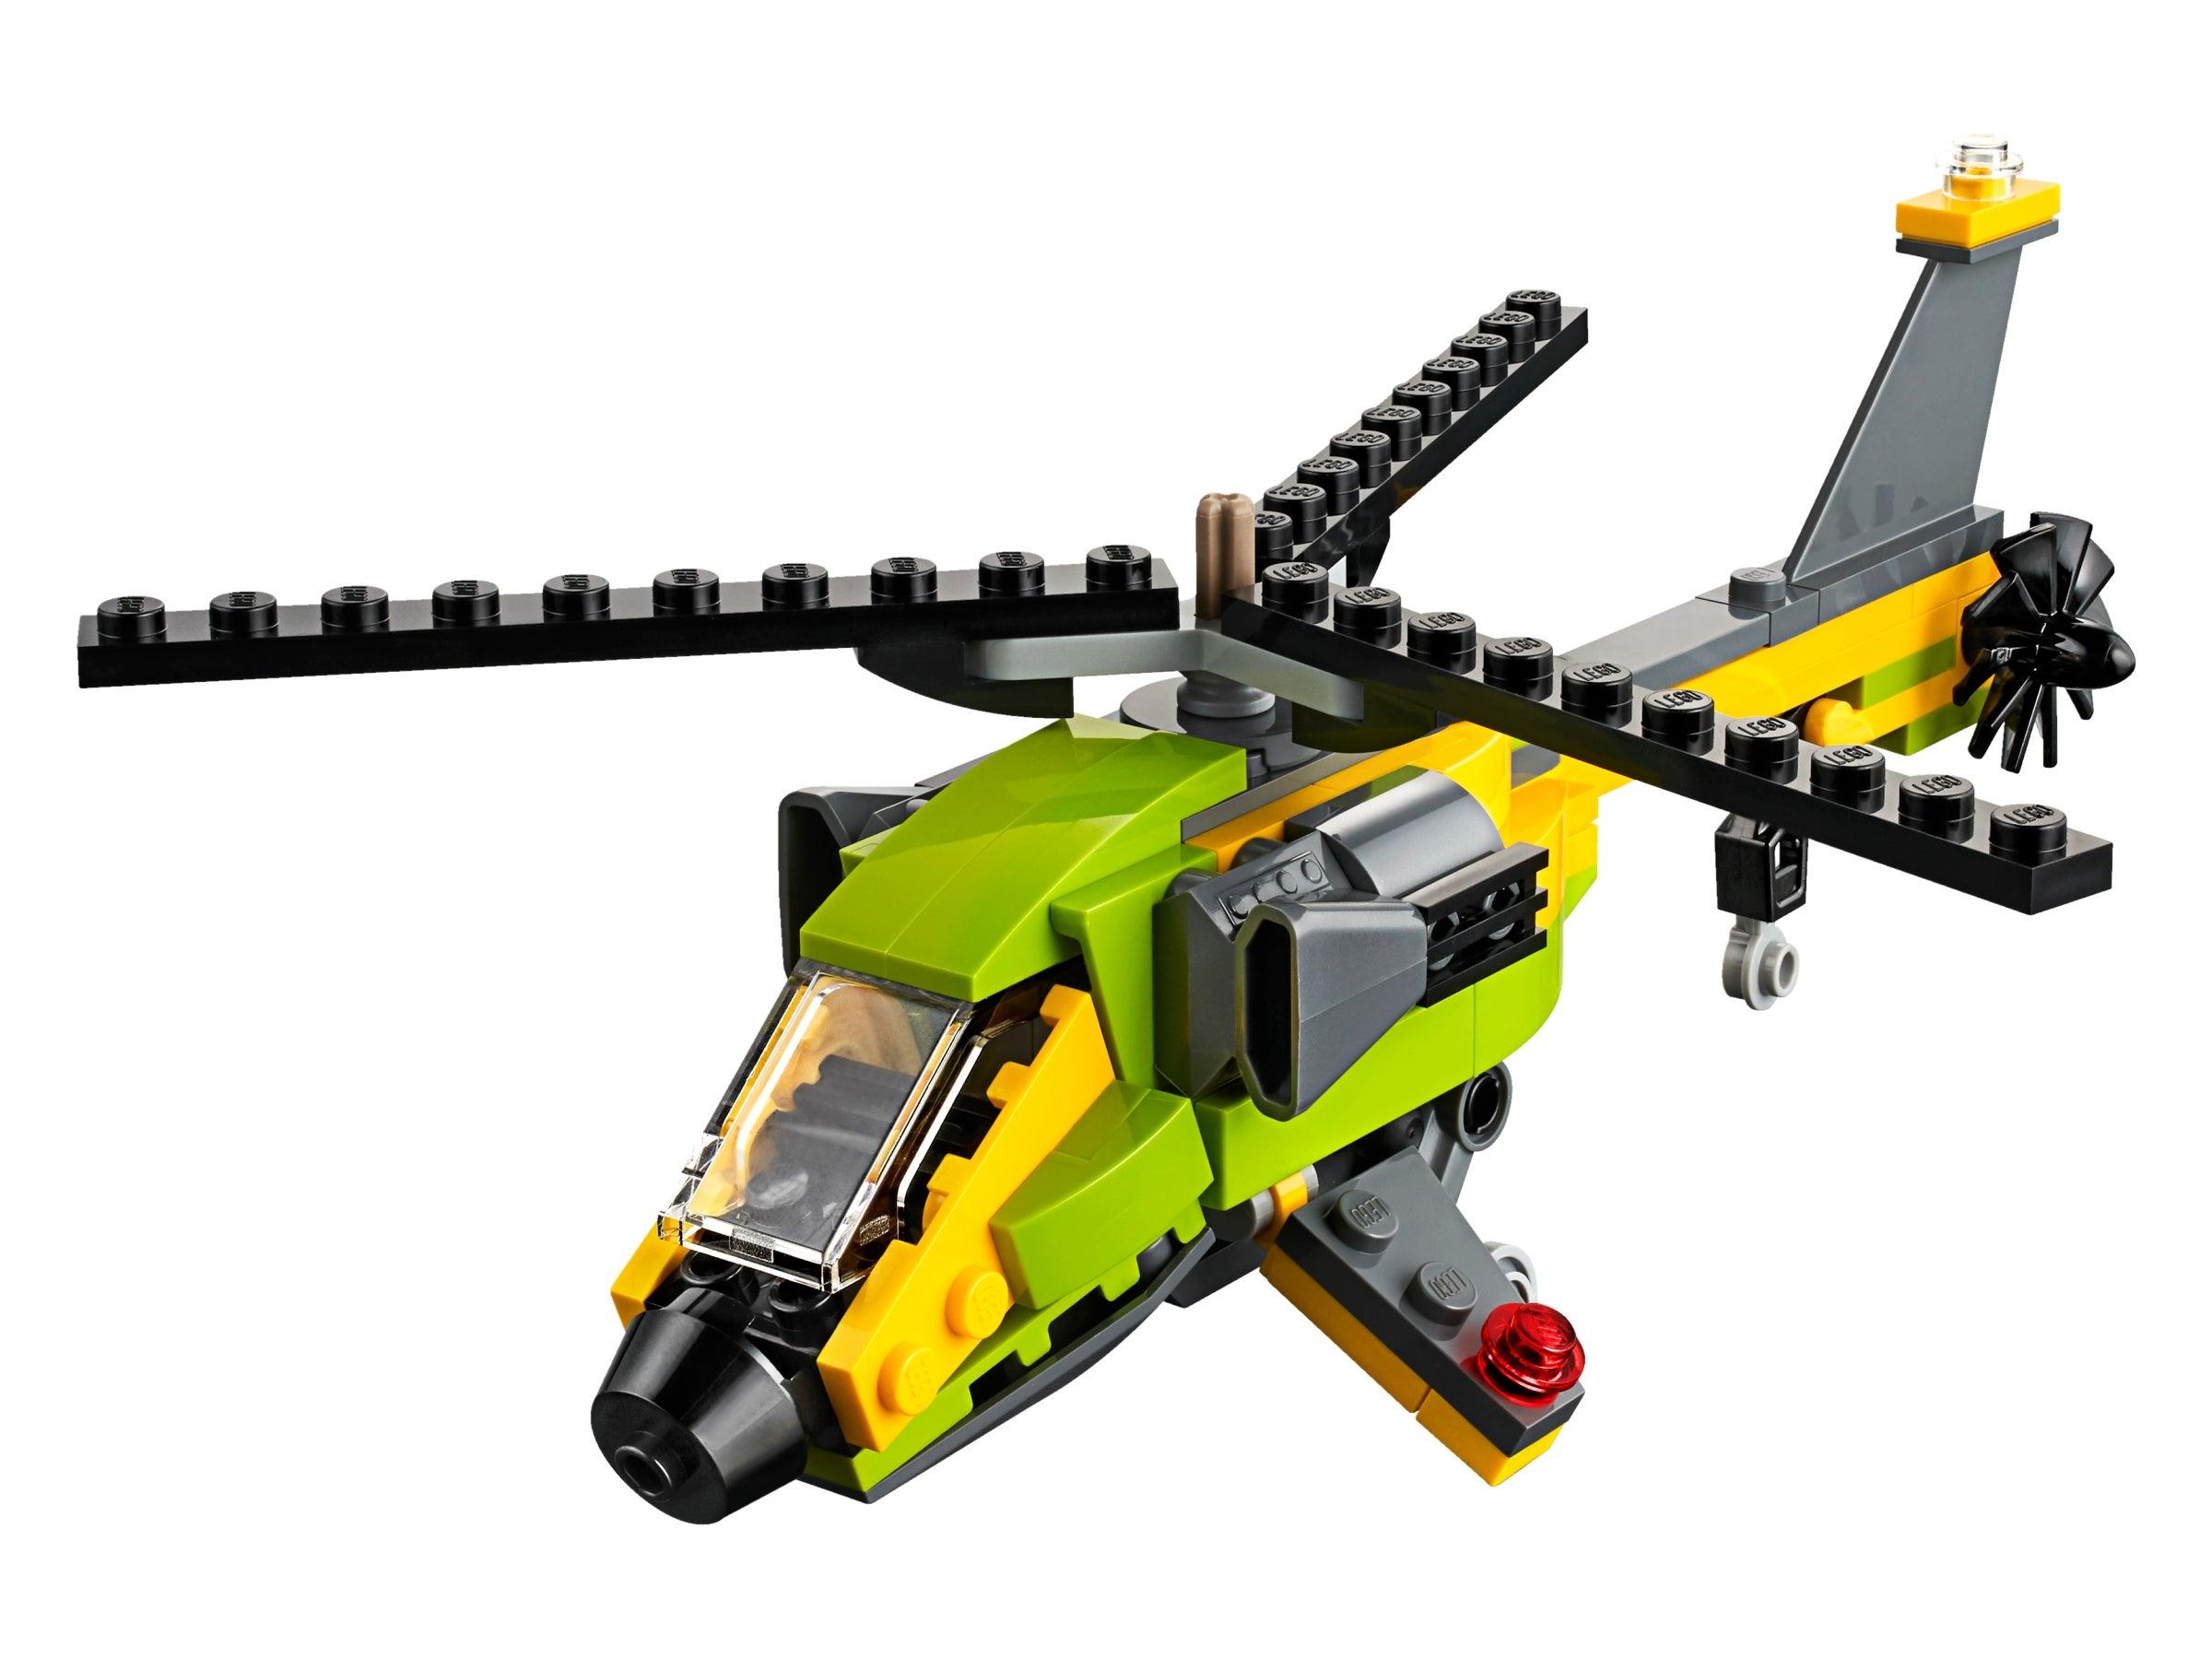 NEU /& OVP 31092  Hubschrauber-Abenteuer LEGO® CREATOR 3-in-1-Set